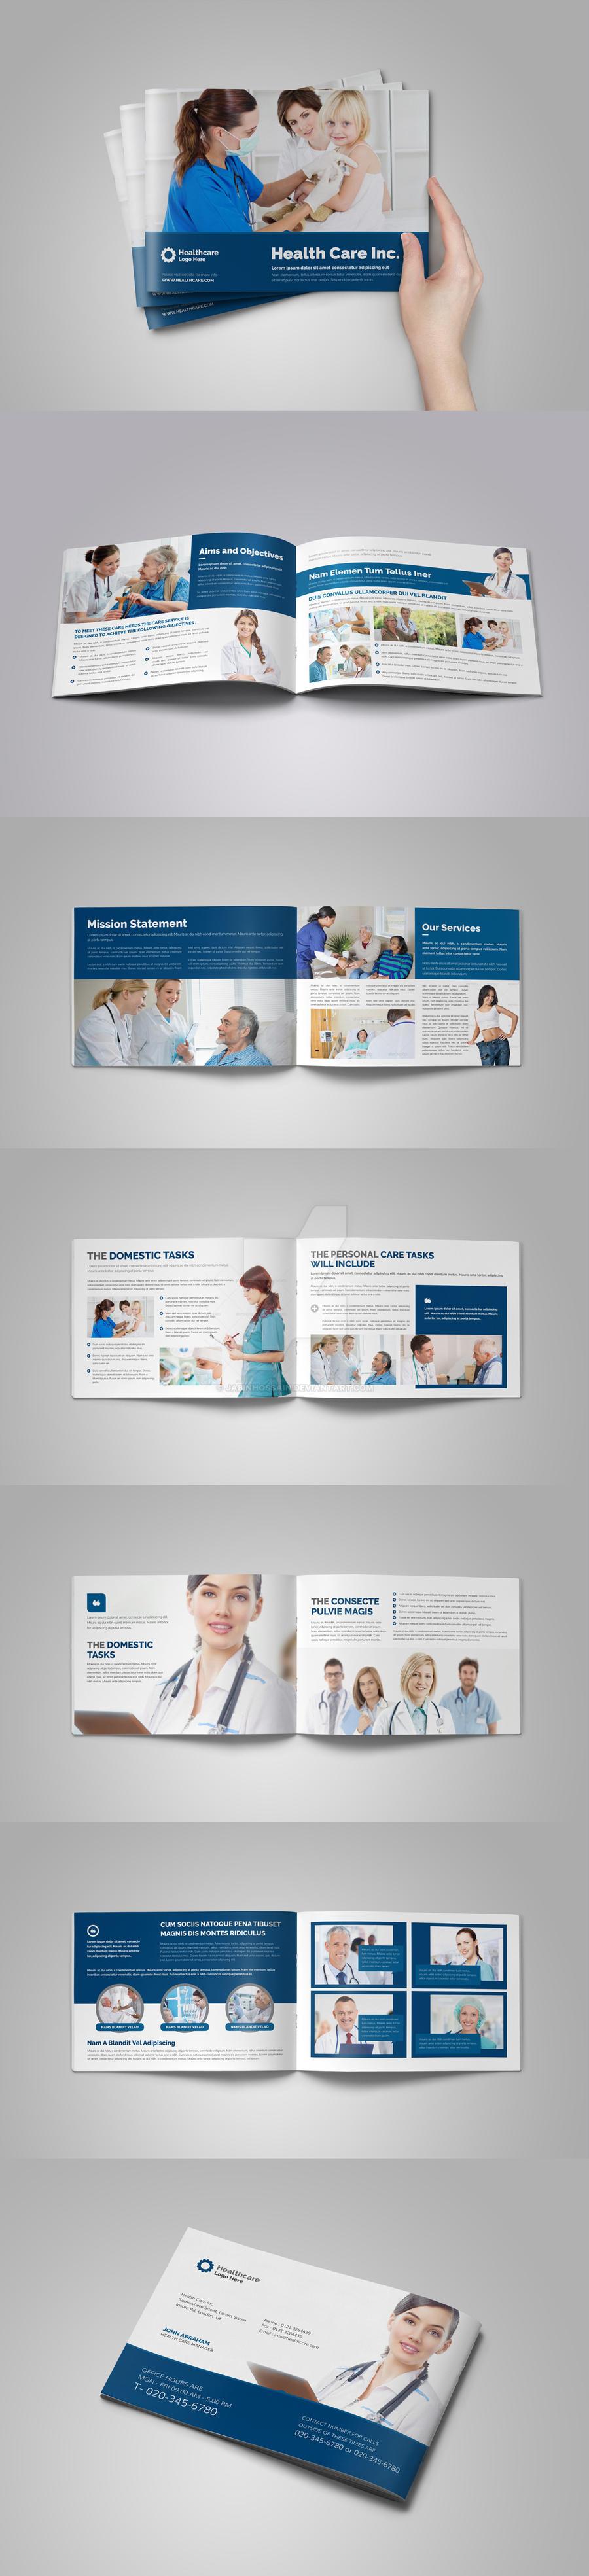 Medical HealthCare Brochure Template